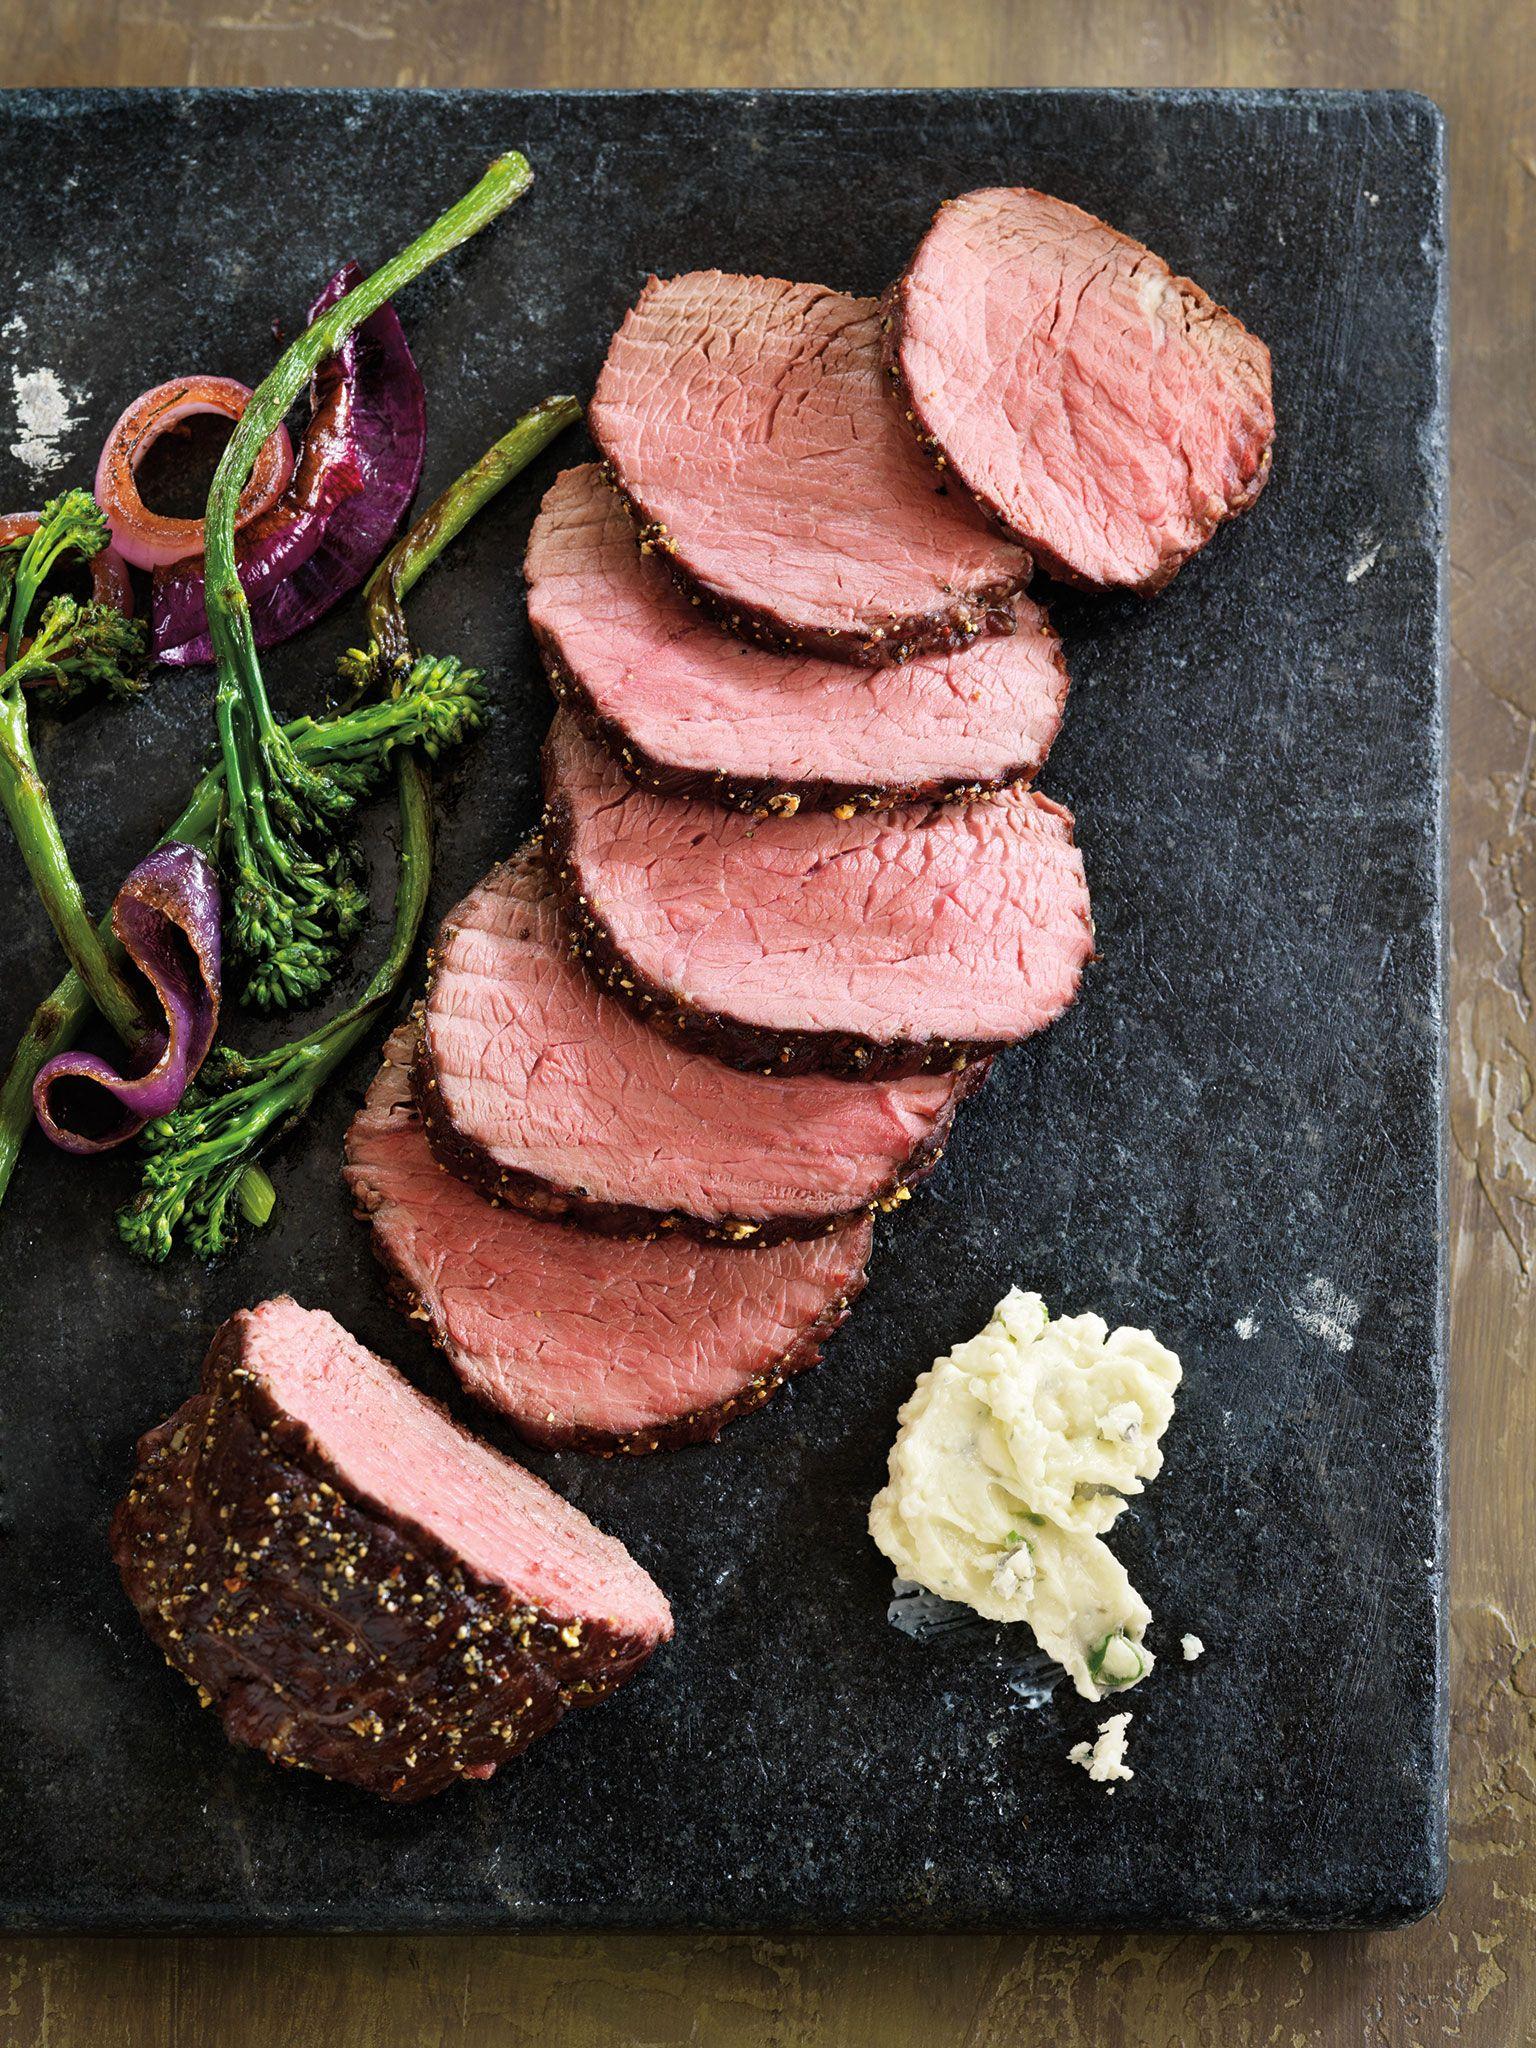 Peppered Top Sirloin Roast with Sautéed Broccolini